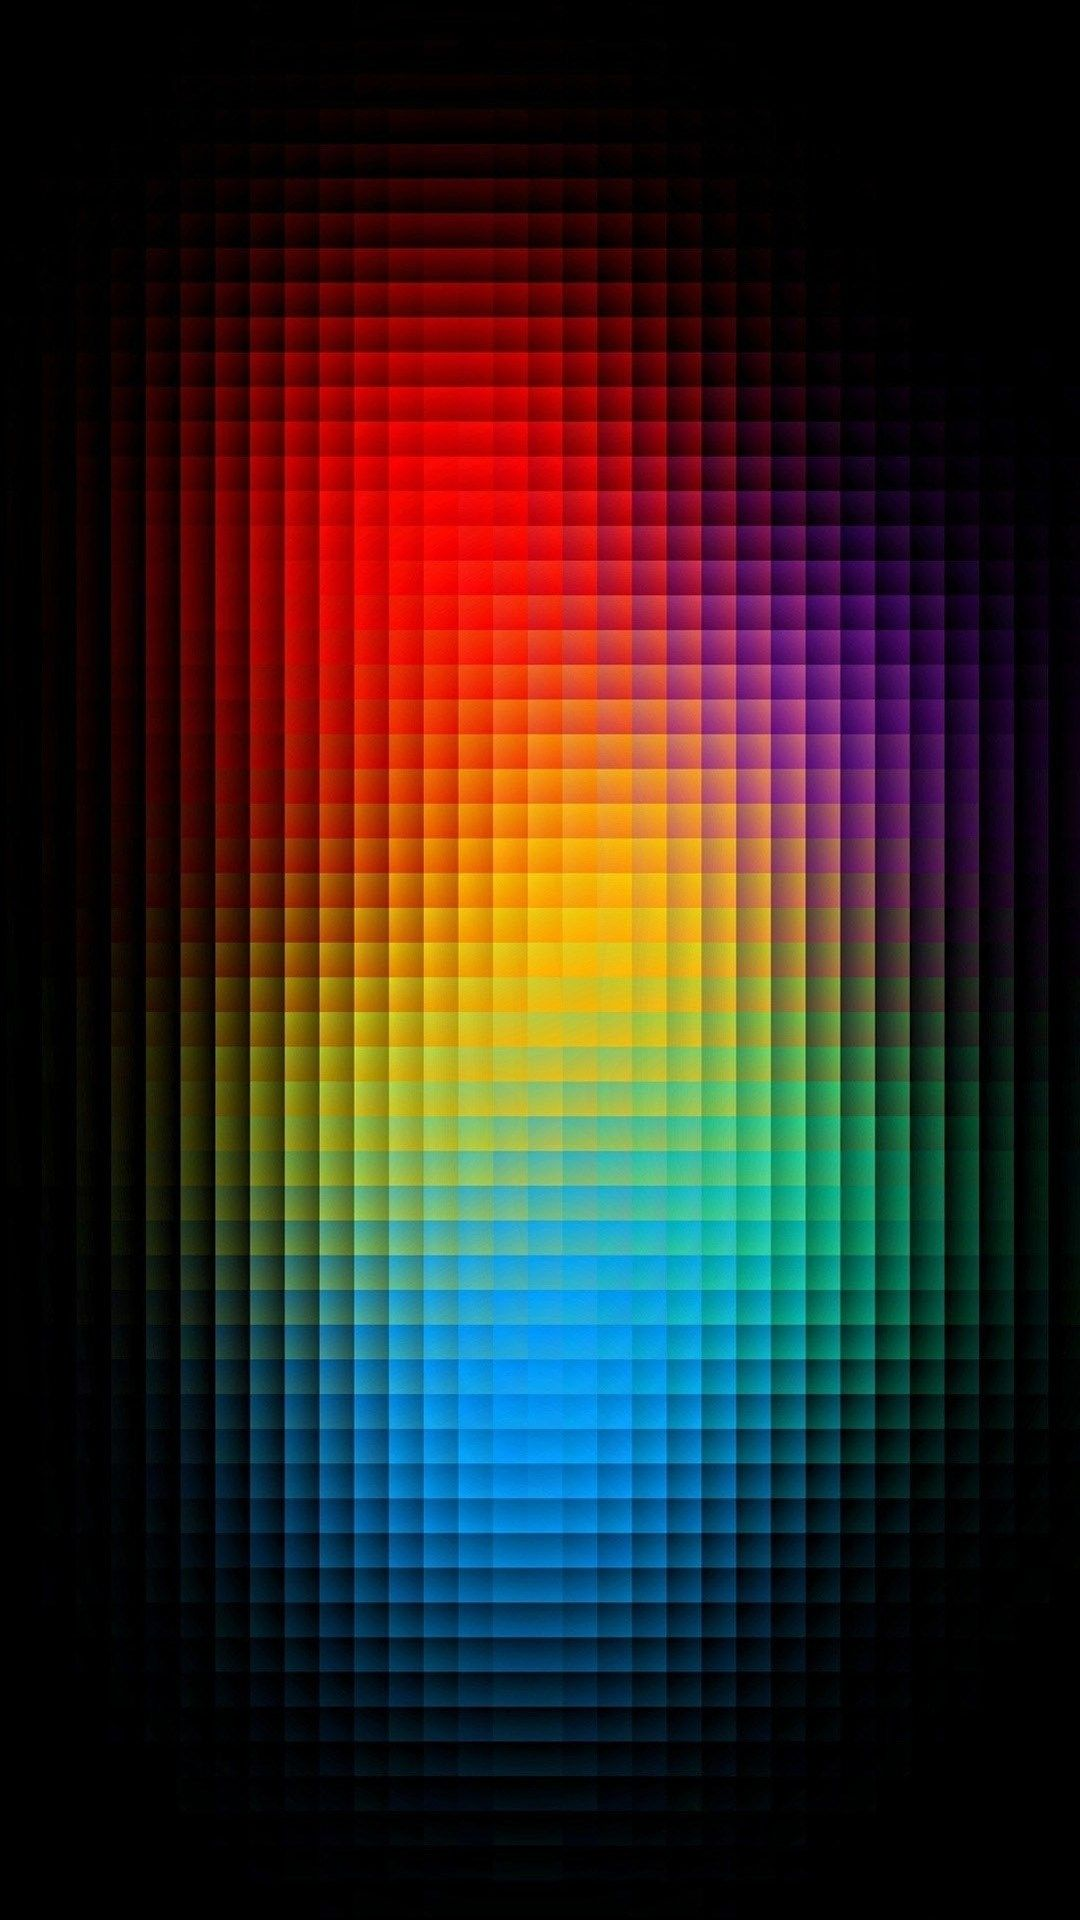 Iphone 6 Plus Wallpaper Colorful Iphone 6 Plus Wallpaper